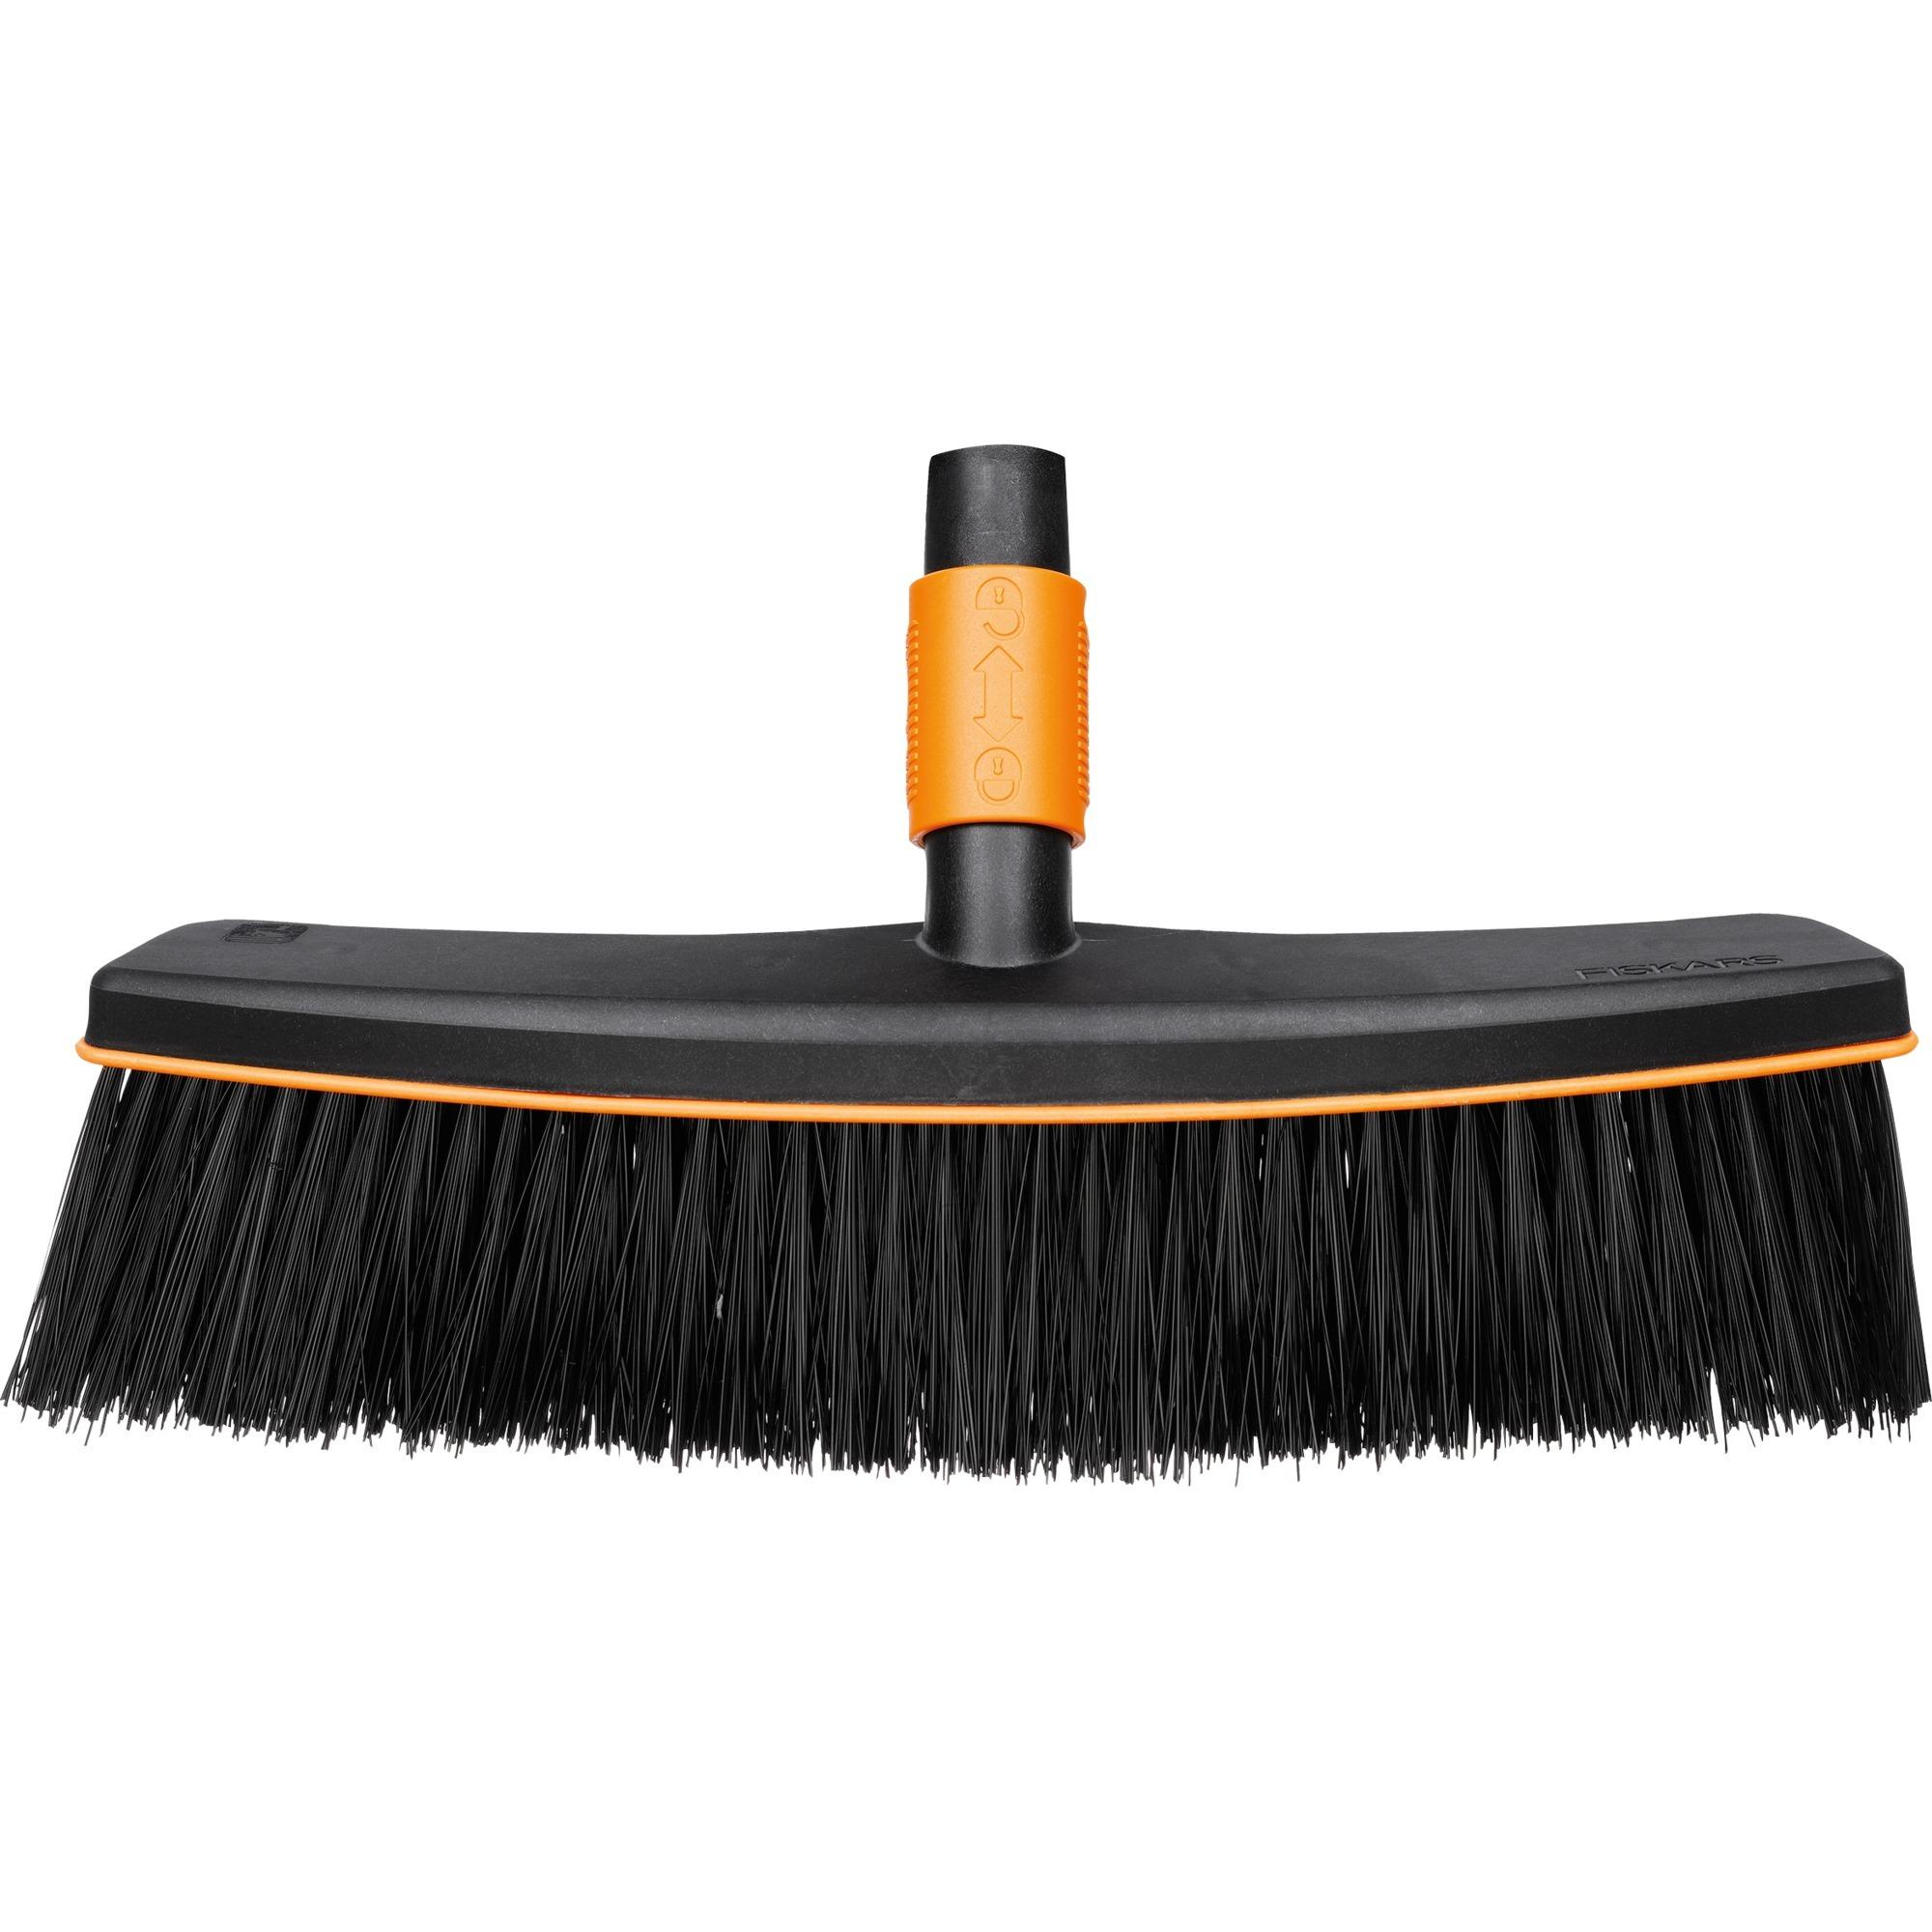 1001416 escoba Negro, Naranja De plástico